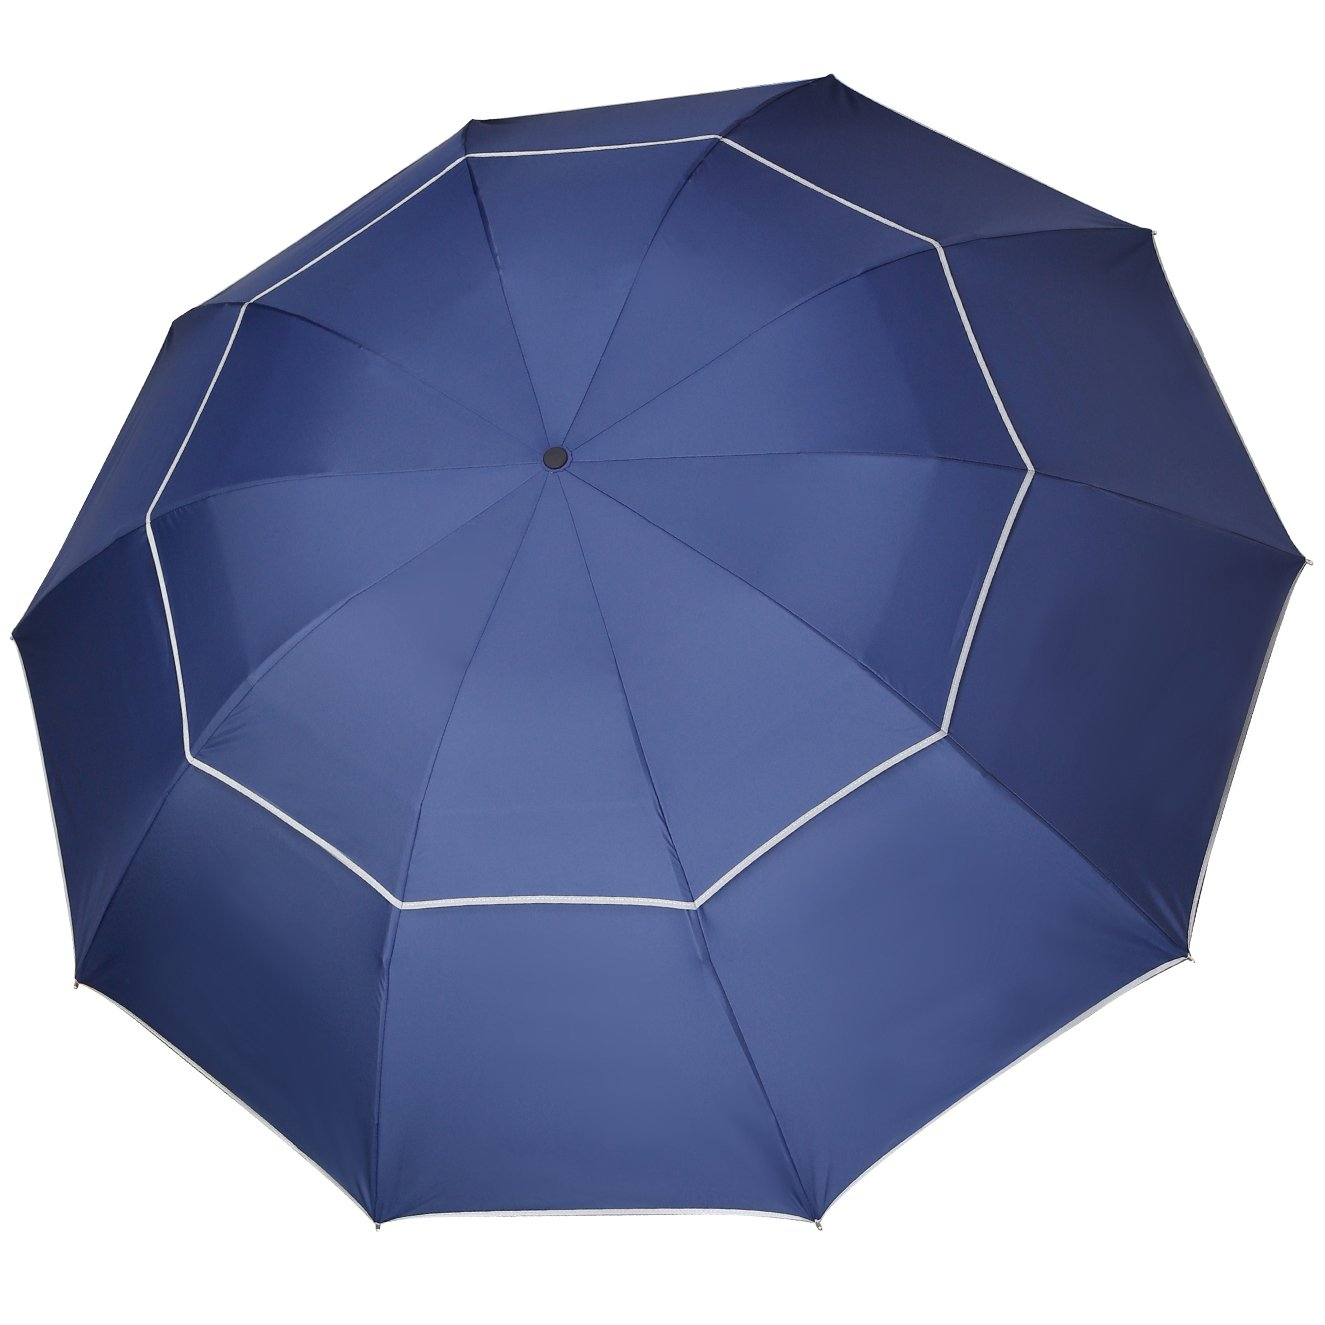 Oversize Large Compact Travel Golf Umbrella